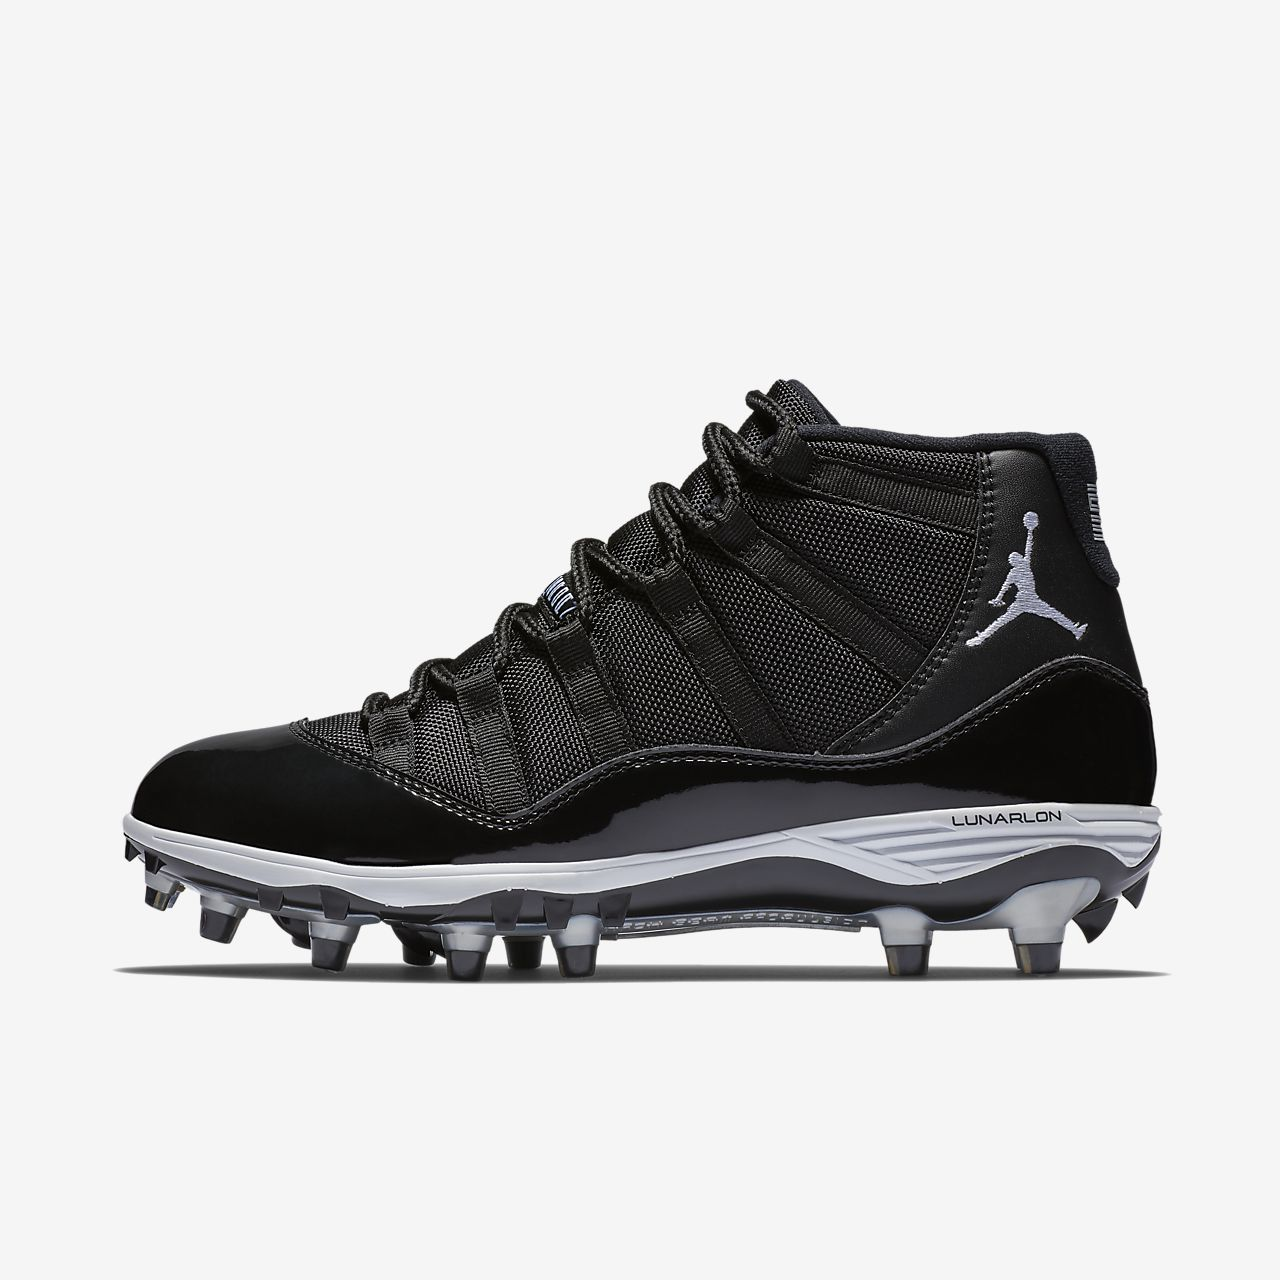 b6f3323a62e1 Jordan XI Retro TD Men s Football Cleat. Nike.com